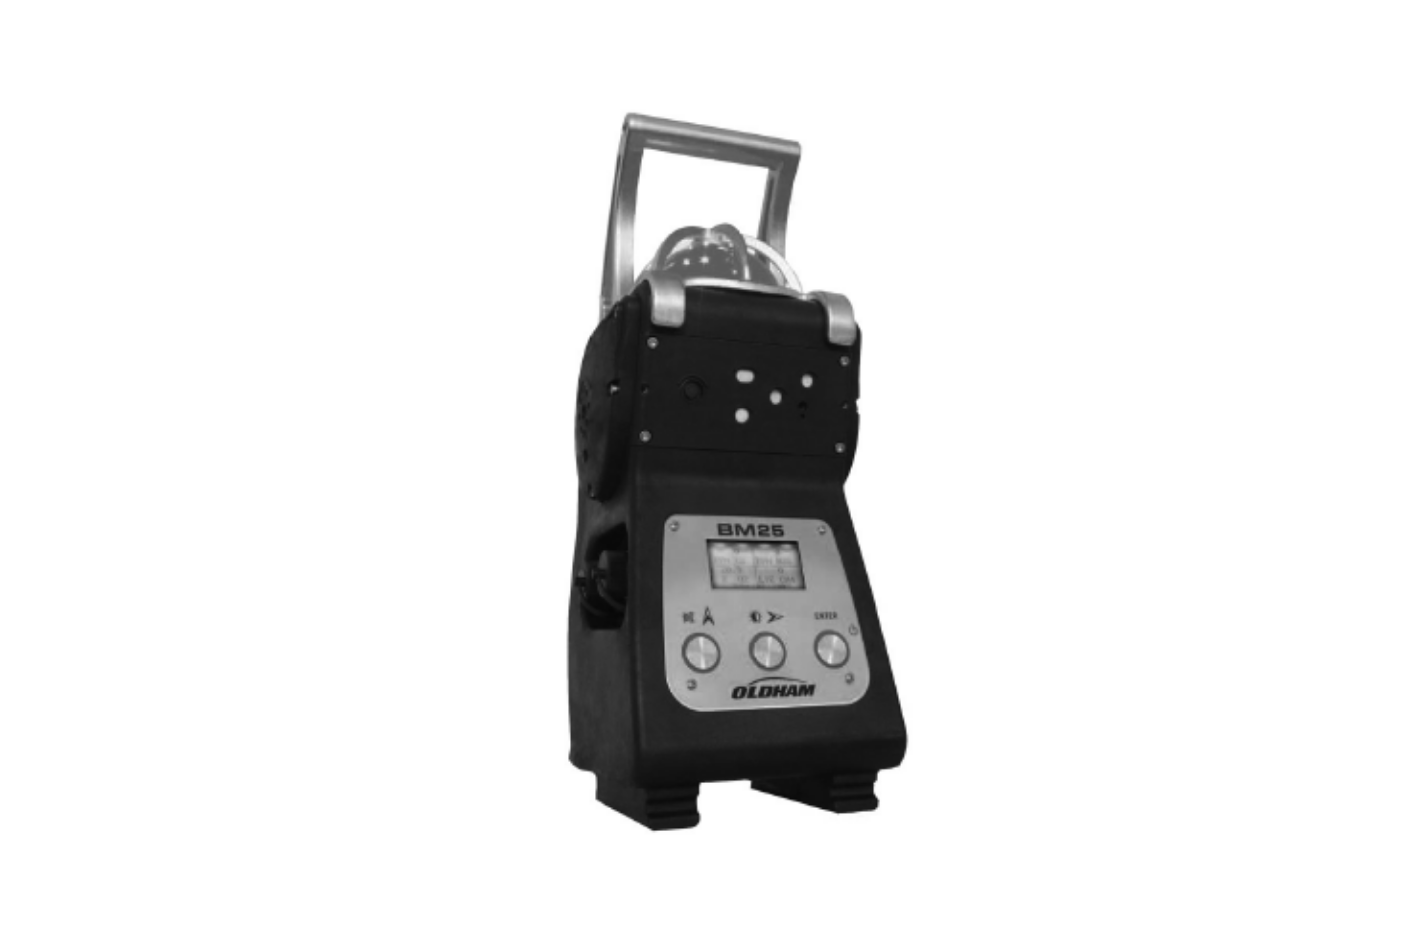 Monitex BM25 Area Gas Monitor